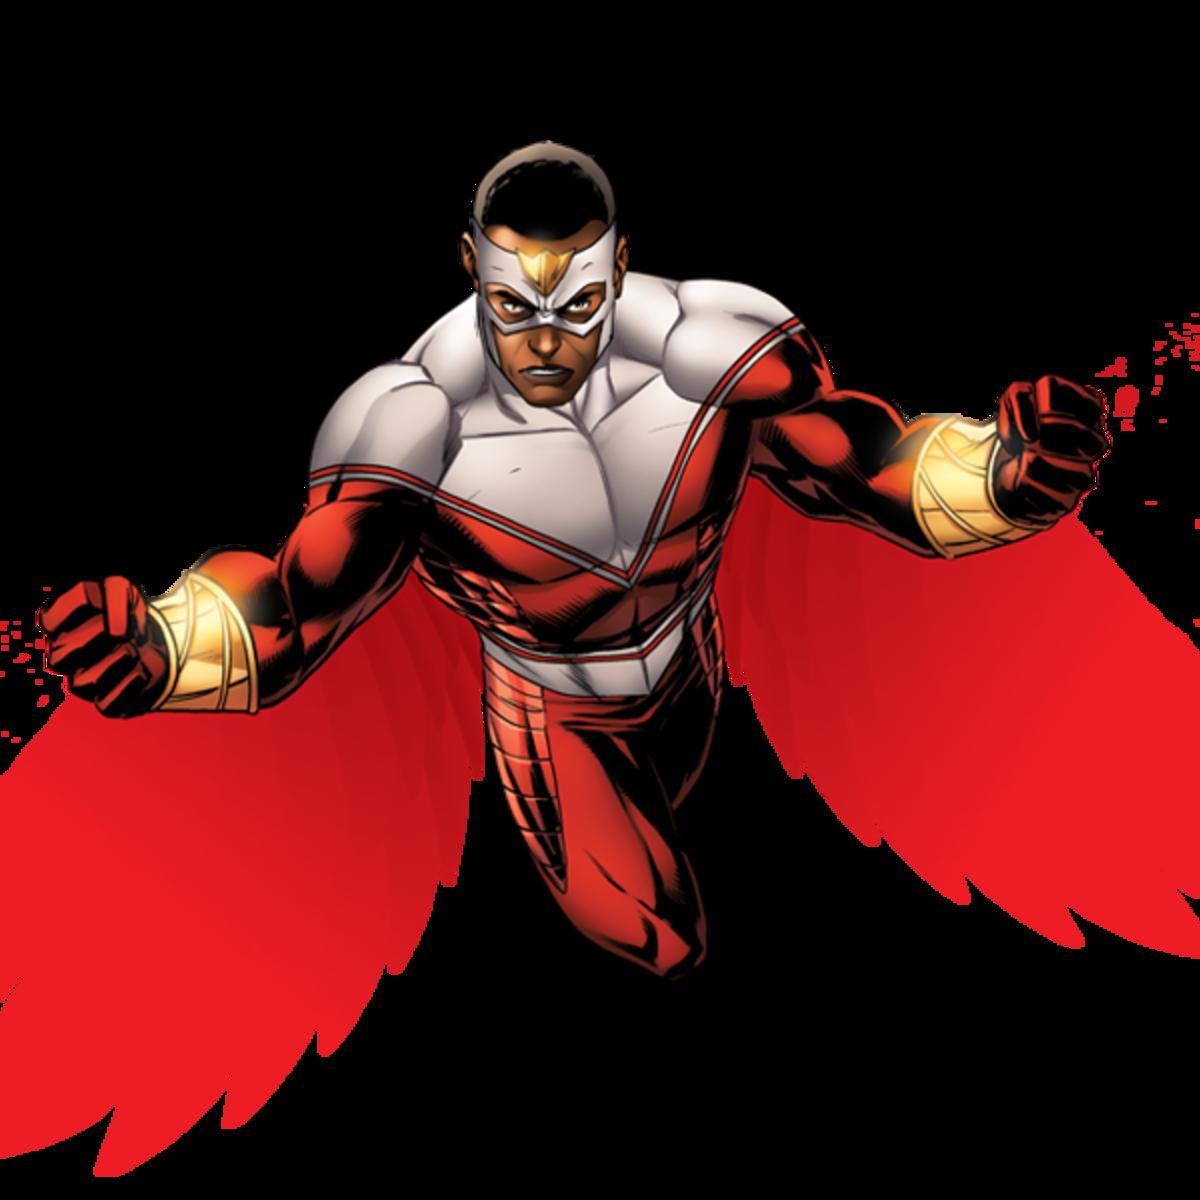 Falcon - Avengers Assemble